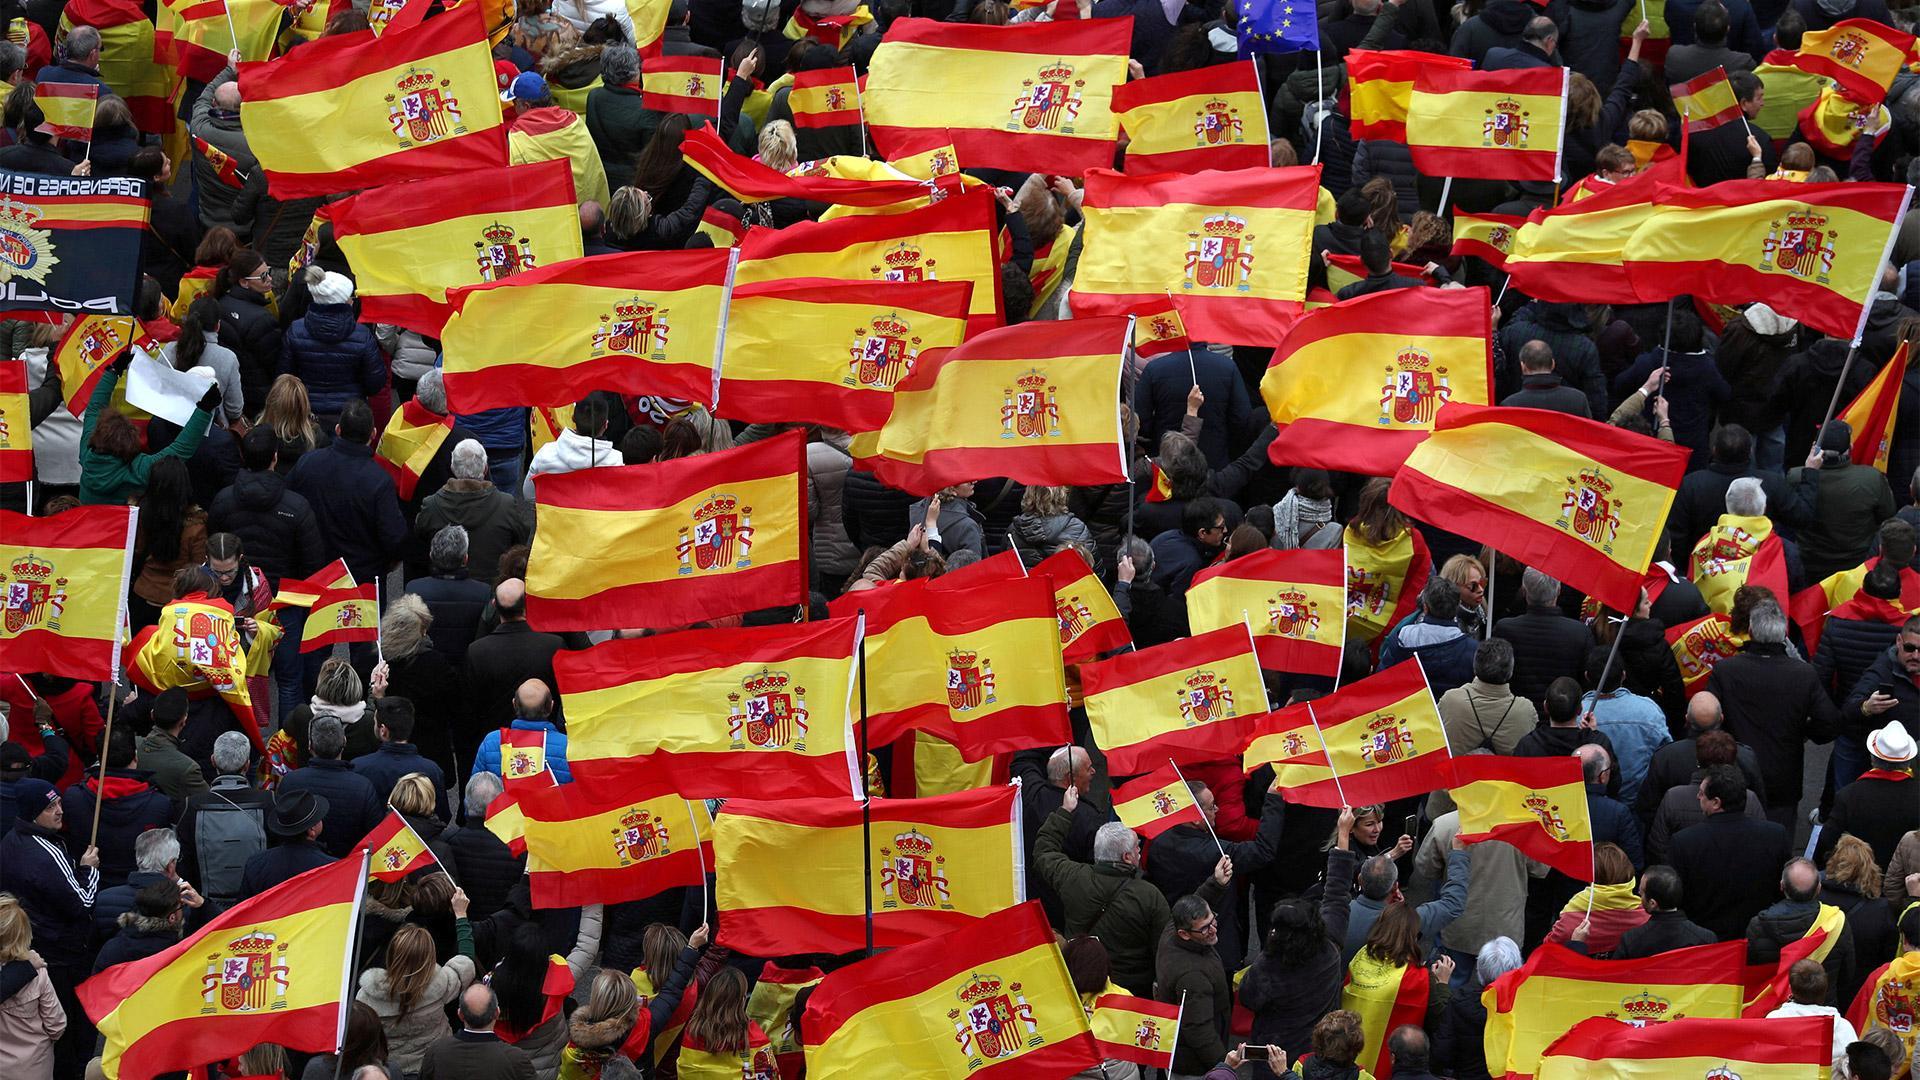 26 октября на улицах Барселоны пройдут забастовки!